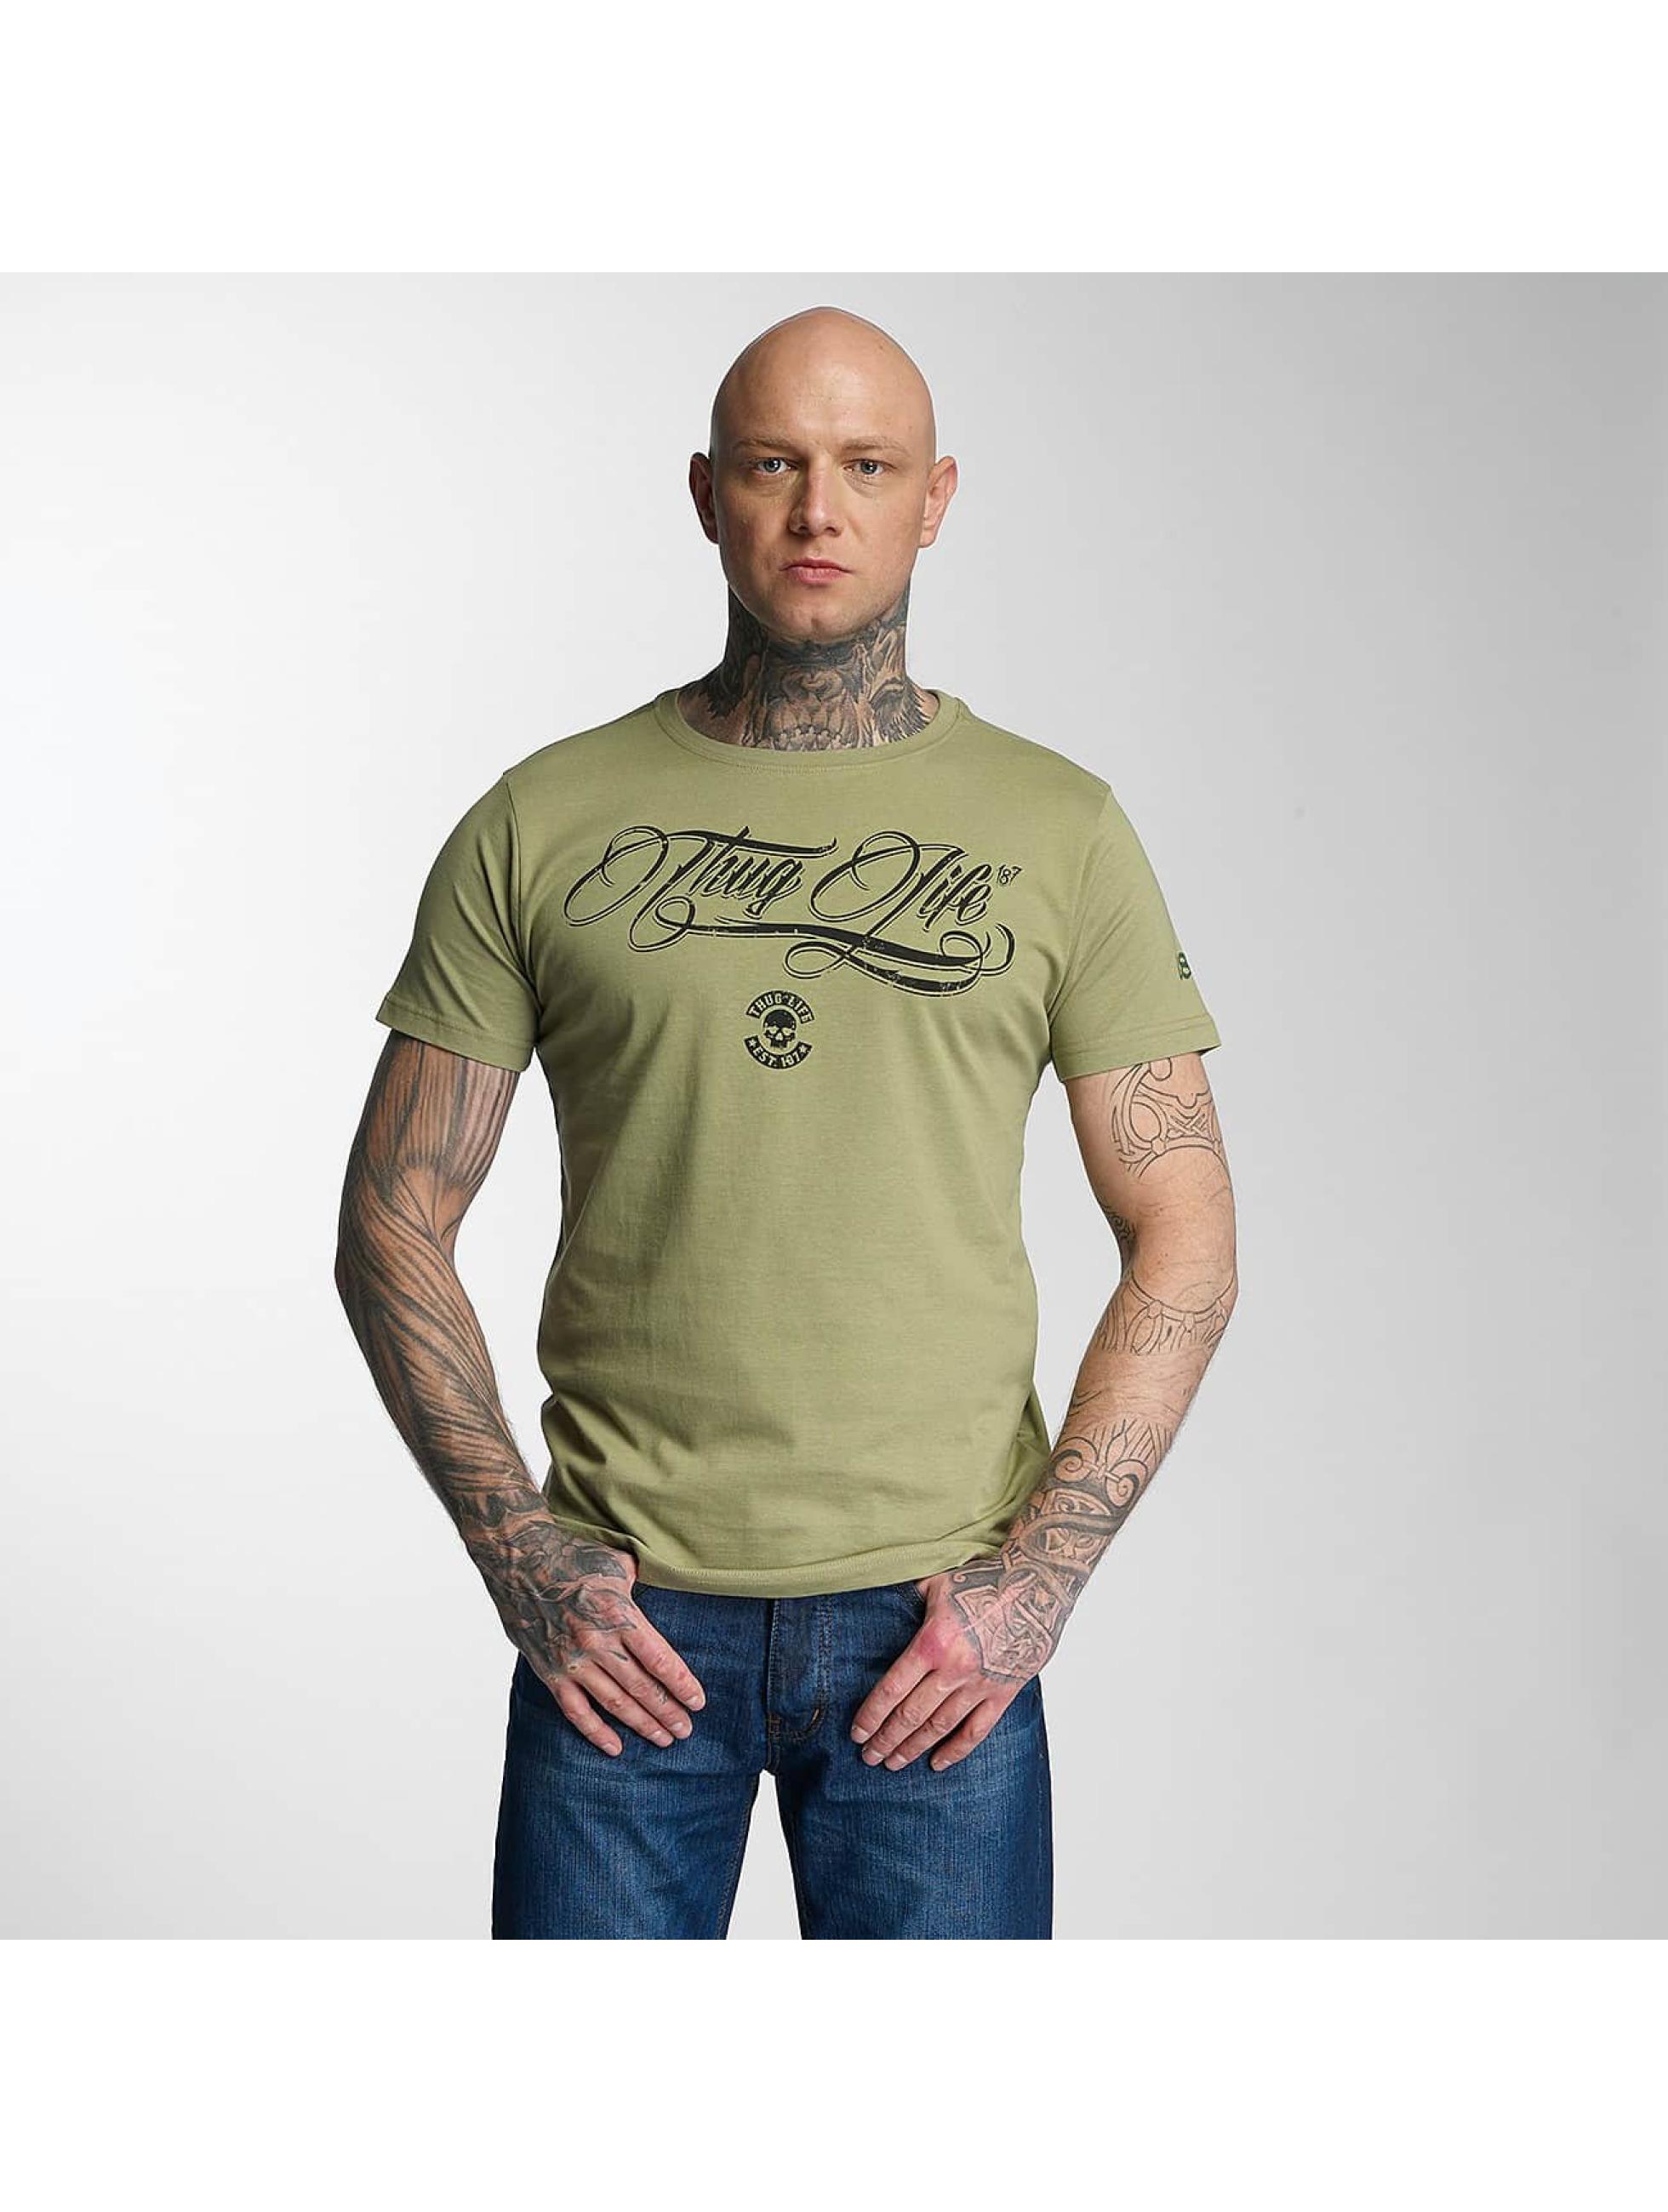 Thug-Life-Uomini-Maglieria-T-shirt-Kursiv